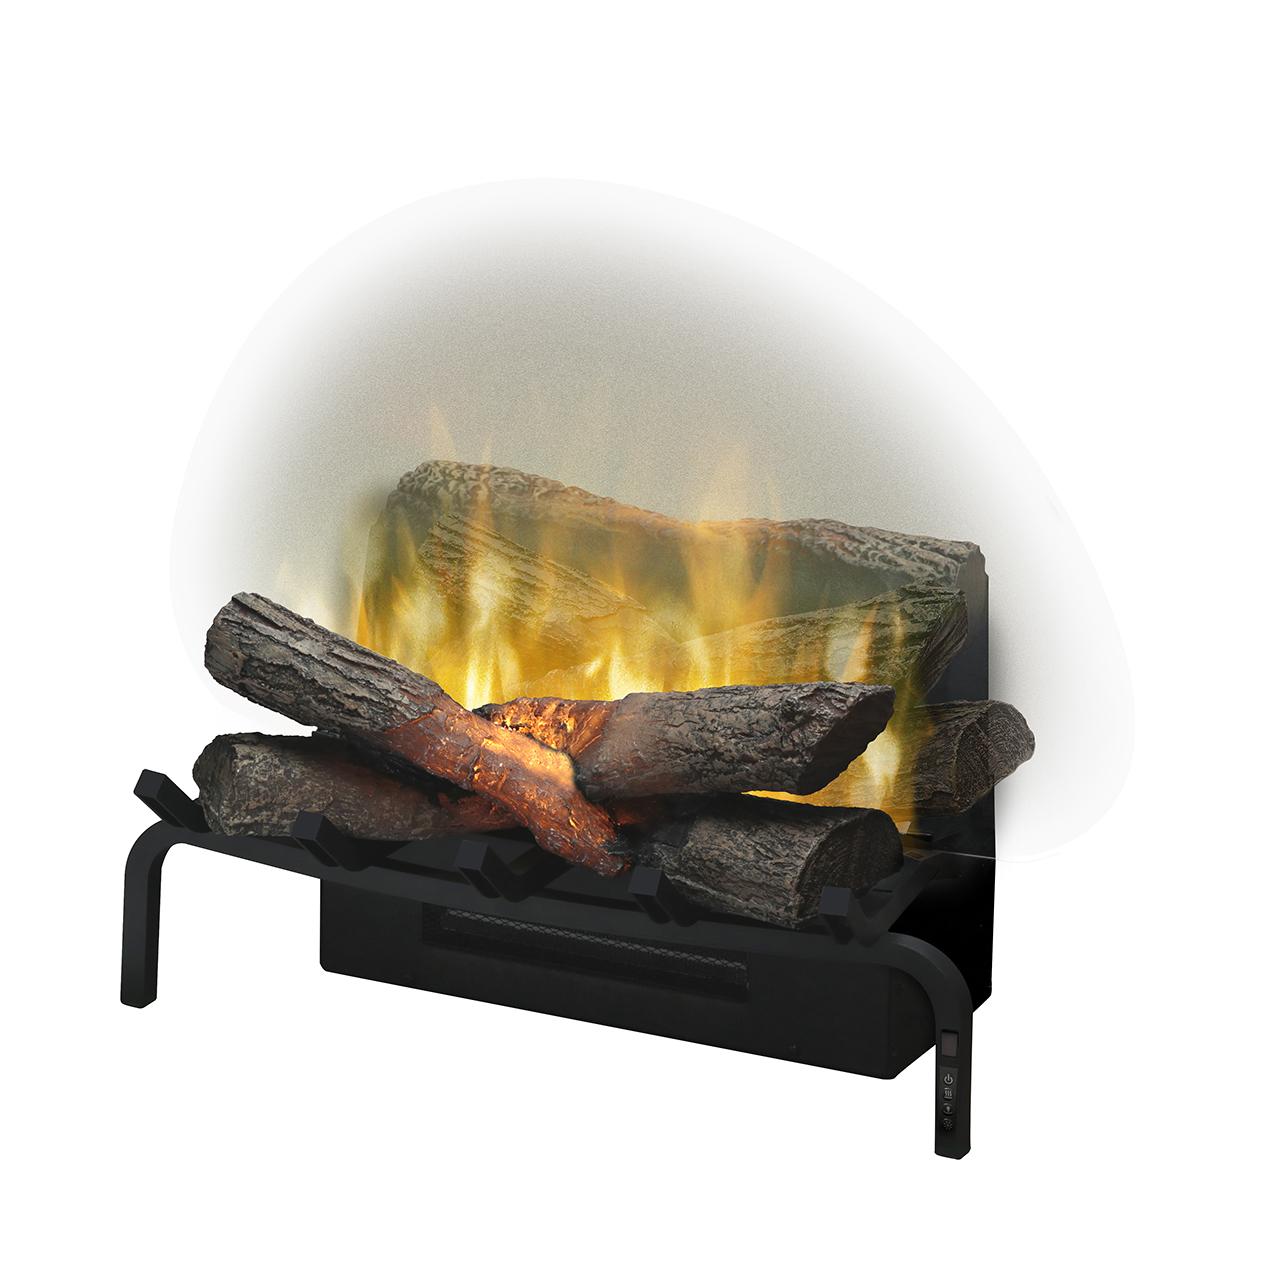 Dimplex Revillusion 20 Electric Log Set Embers Fireplaces